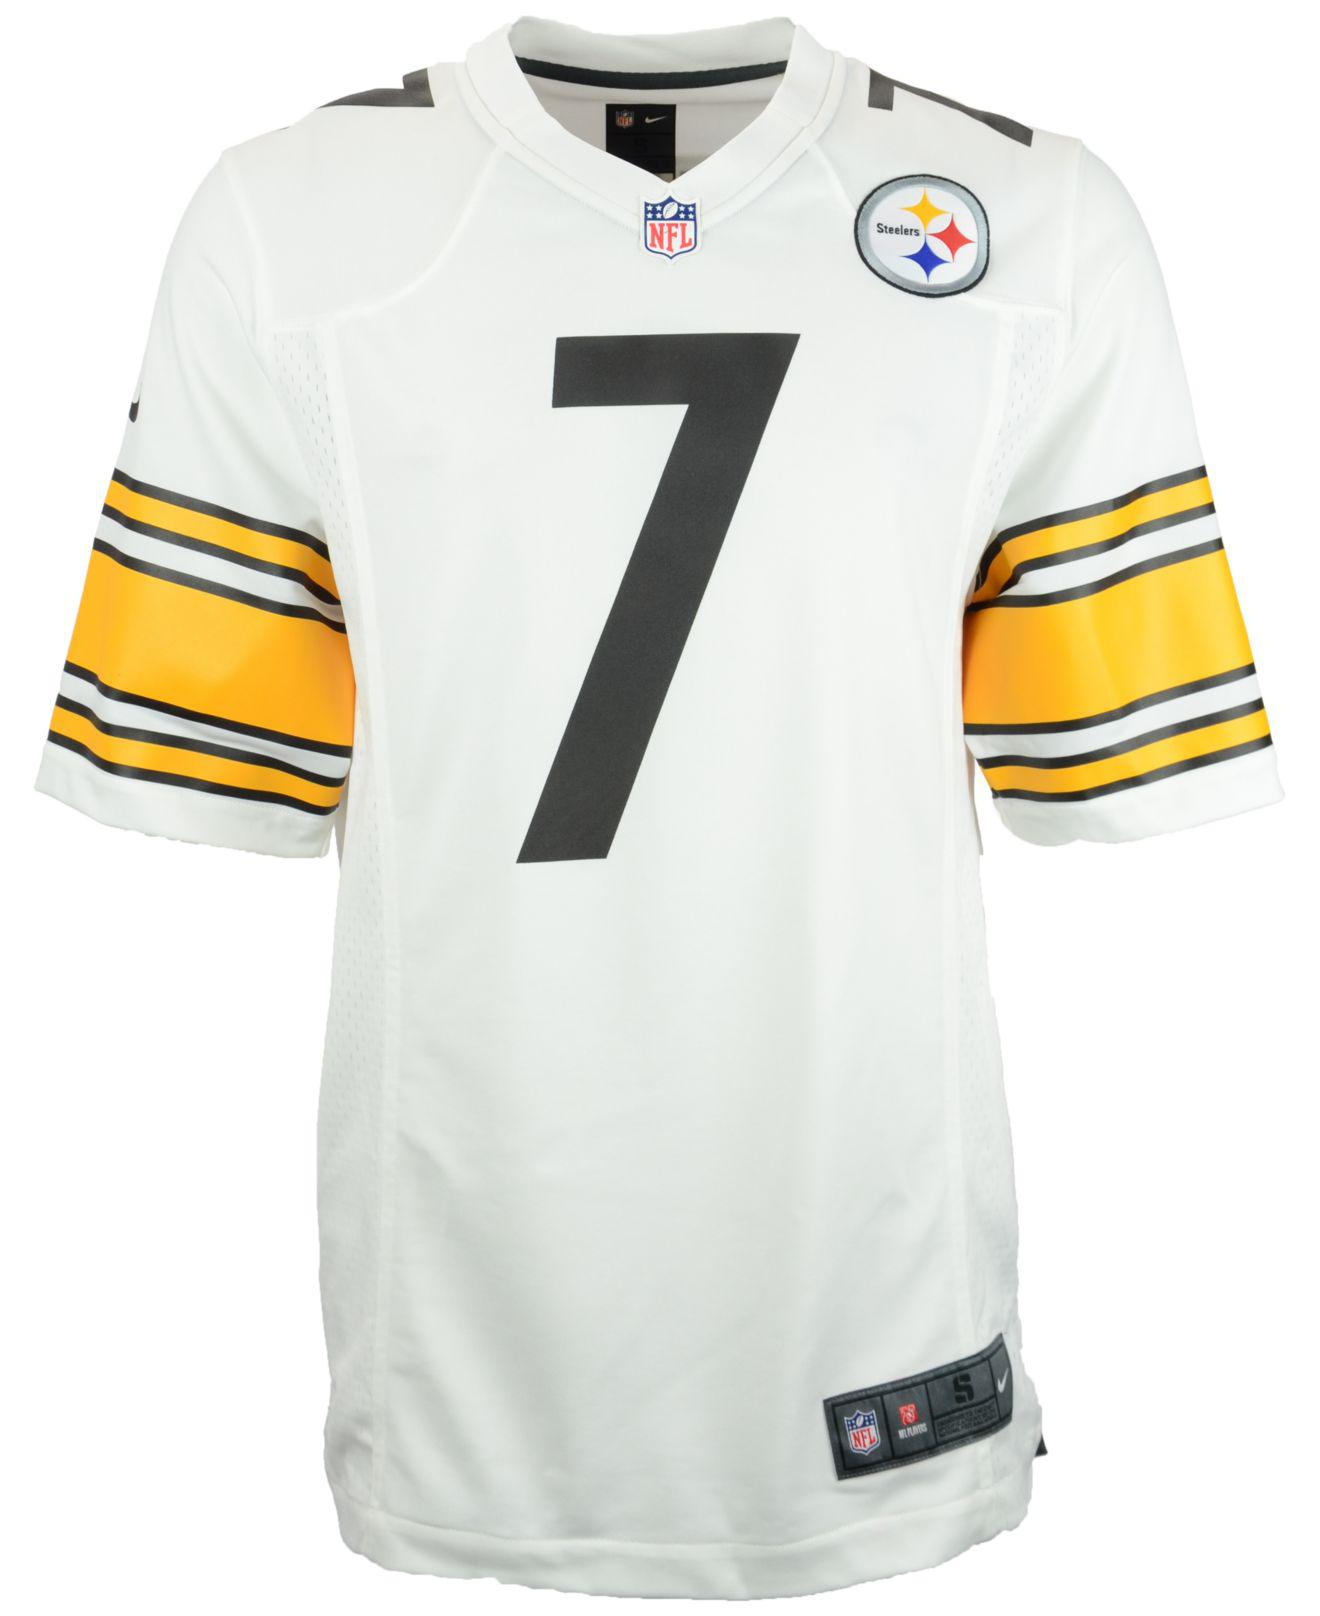 4ea6debbf Lyst - Nike Men s Ben Roethlisberger Pittsburgh Steelers Game Jersey in  White for Men